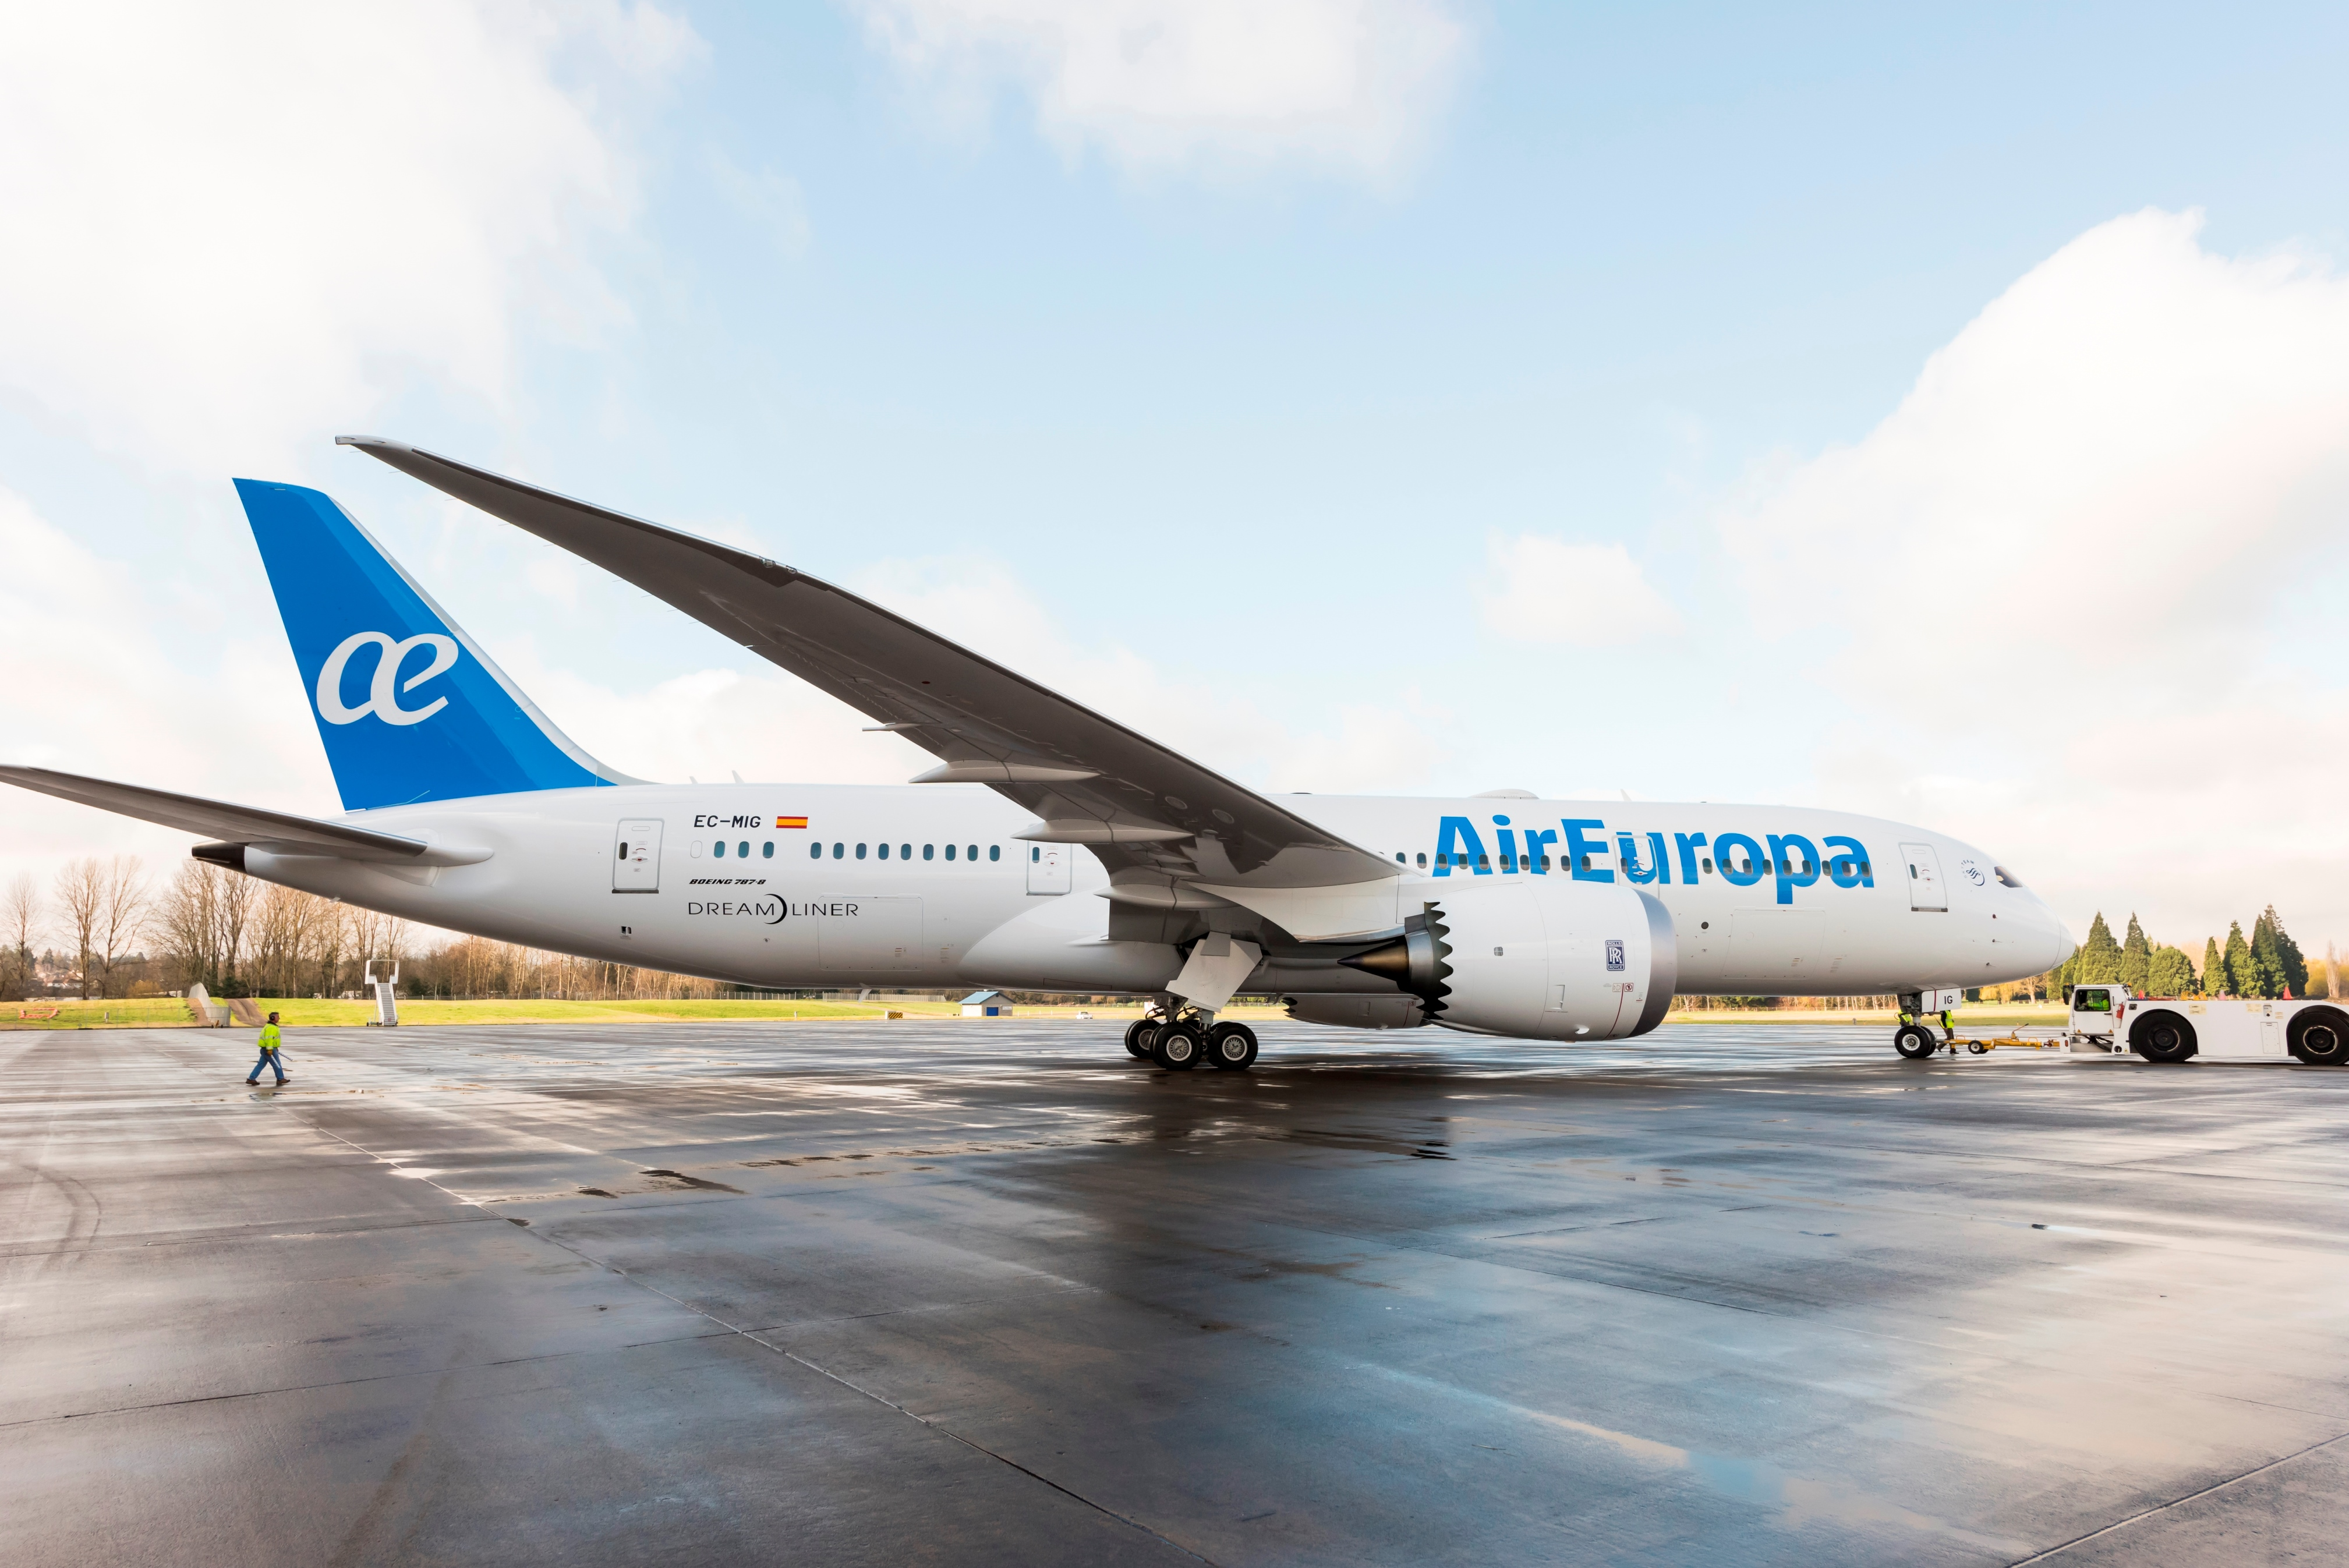 Appareil Boeing 787 Dreamliner